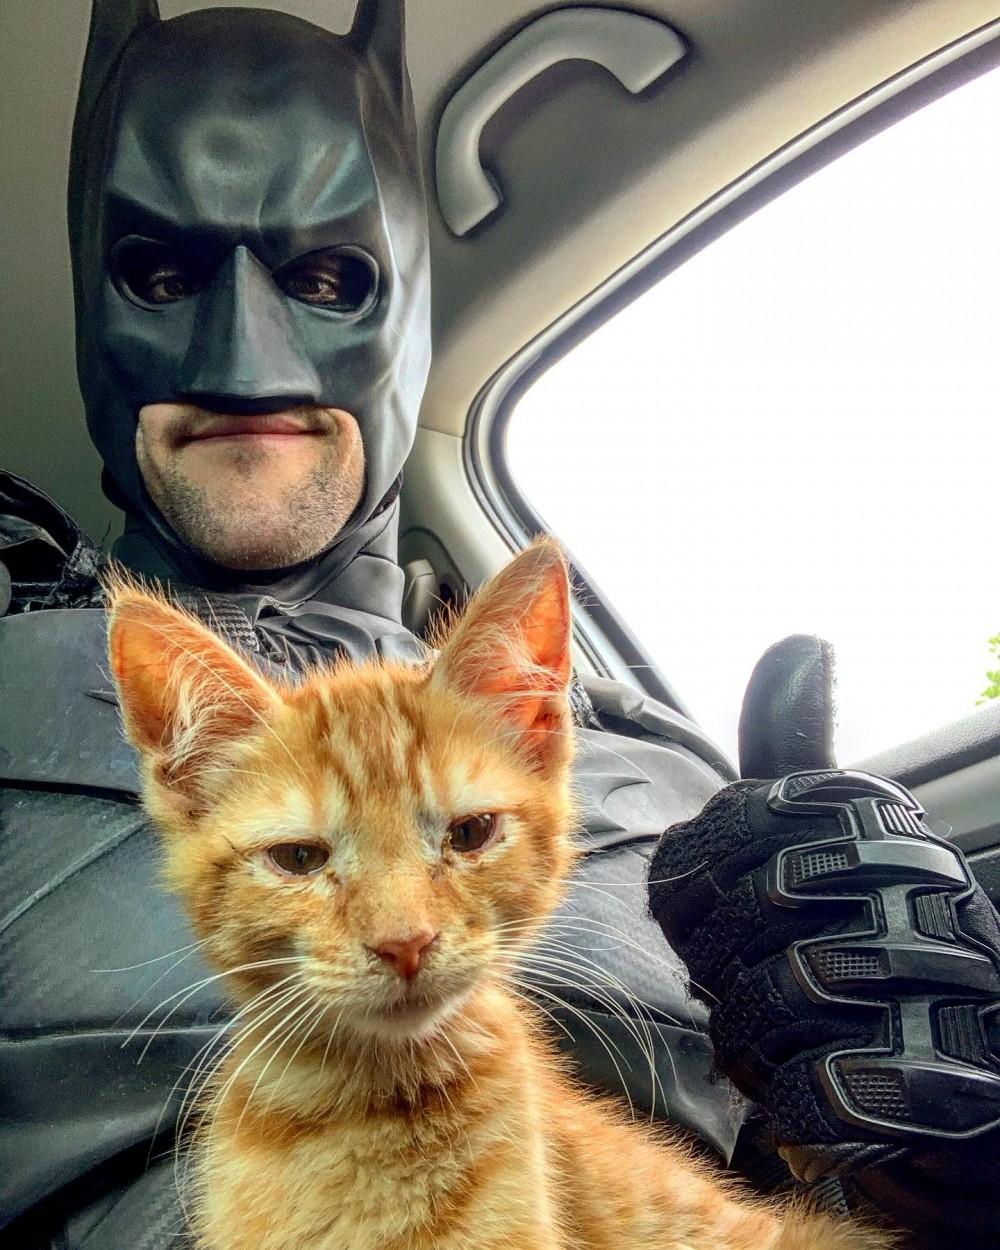 Fuente: Batman4Paws